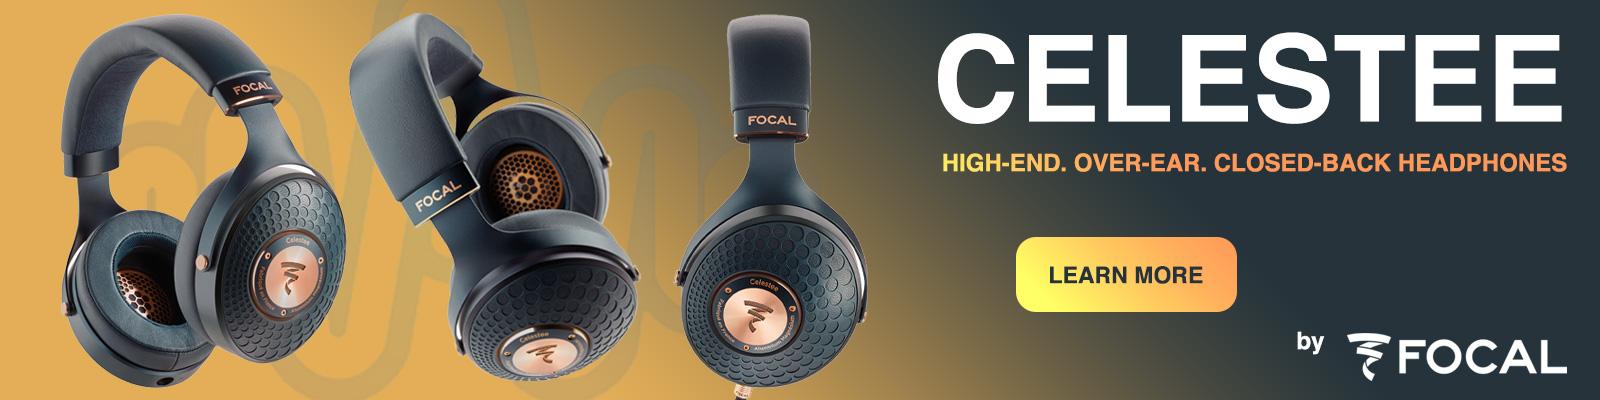 Celestee High-End, Over-Ear, Closed-Back Headphones, by Focal